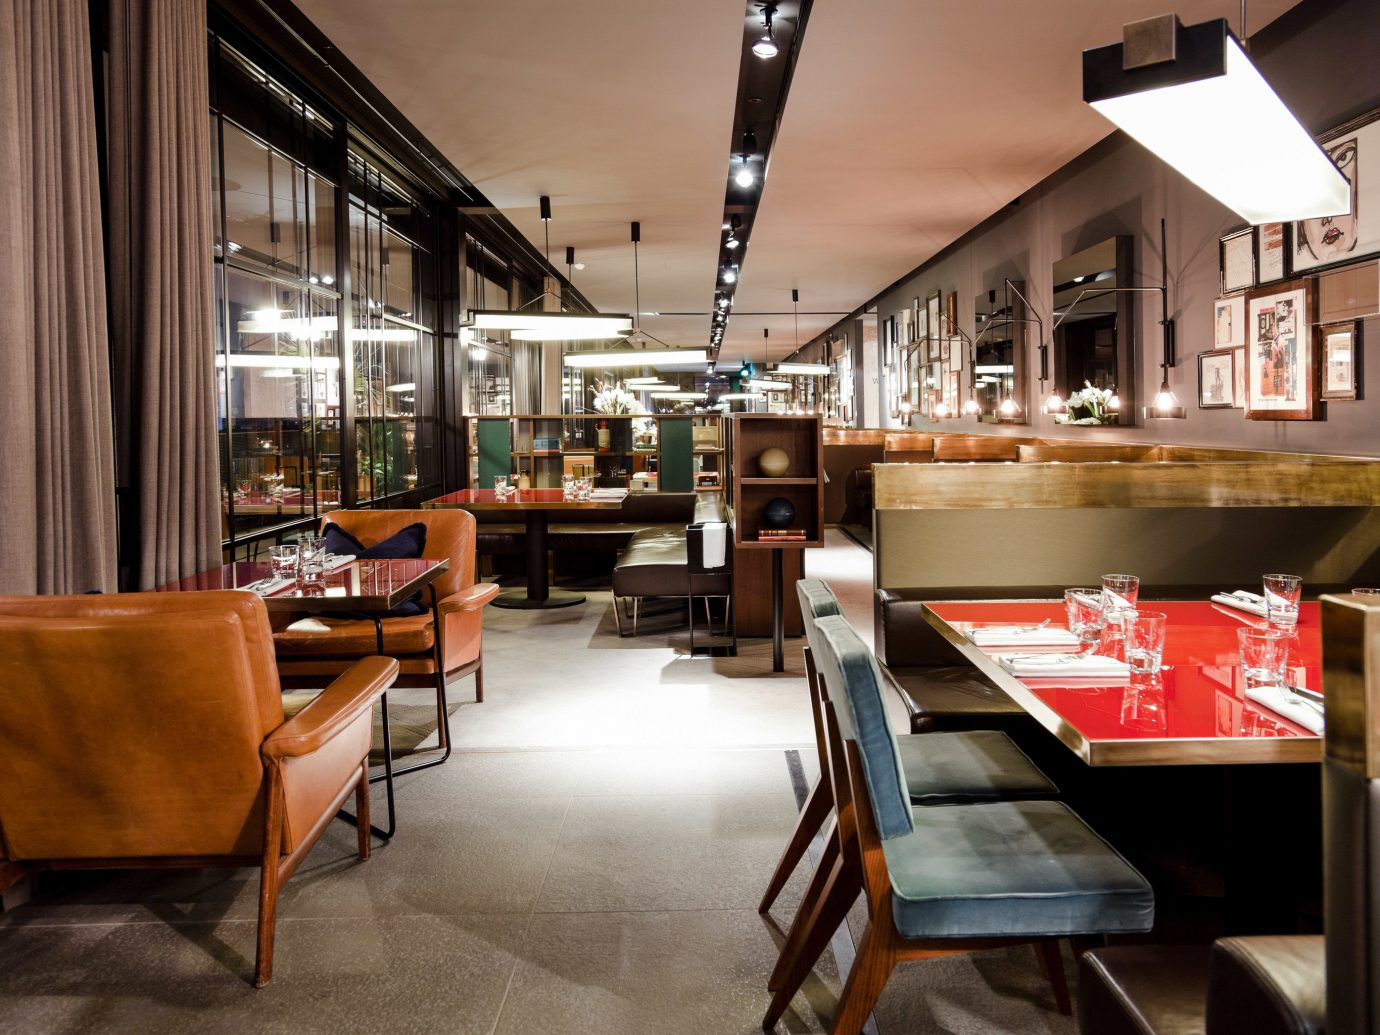 Arts + Culture Italy Milan floor indoor room table Living window chair restaurant interior design café furniture area